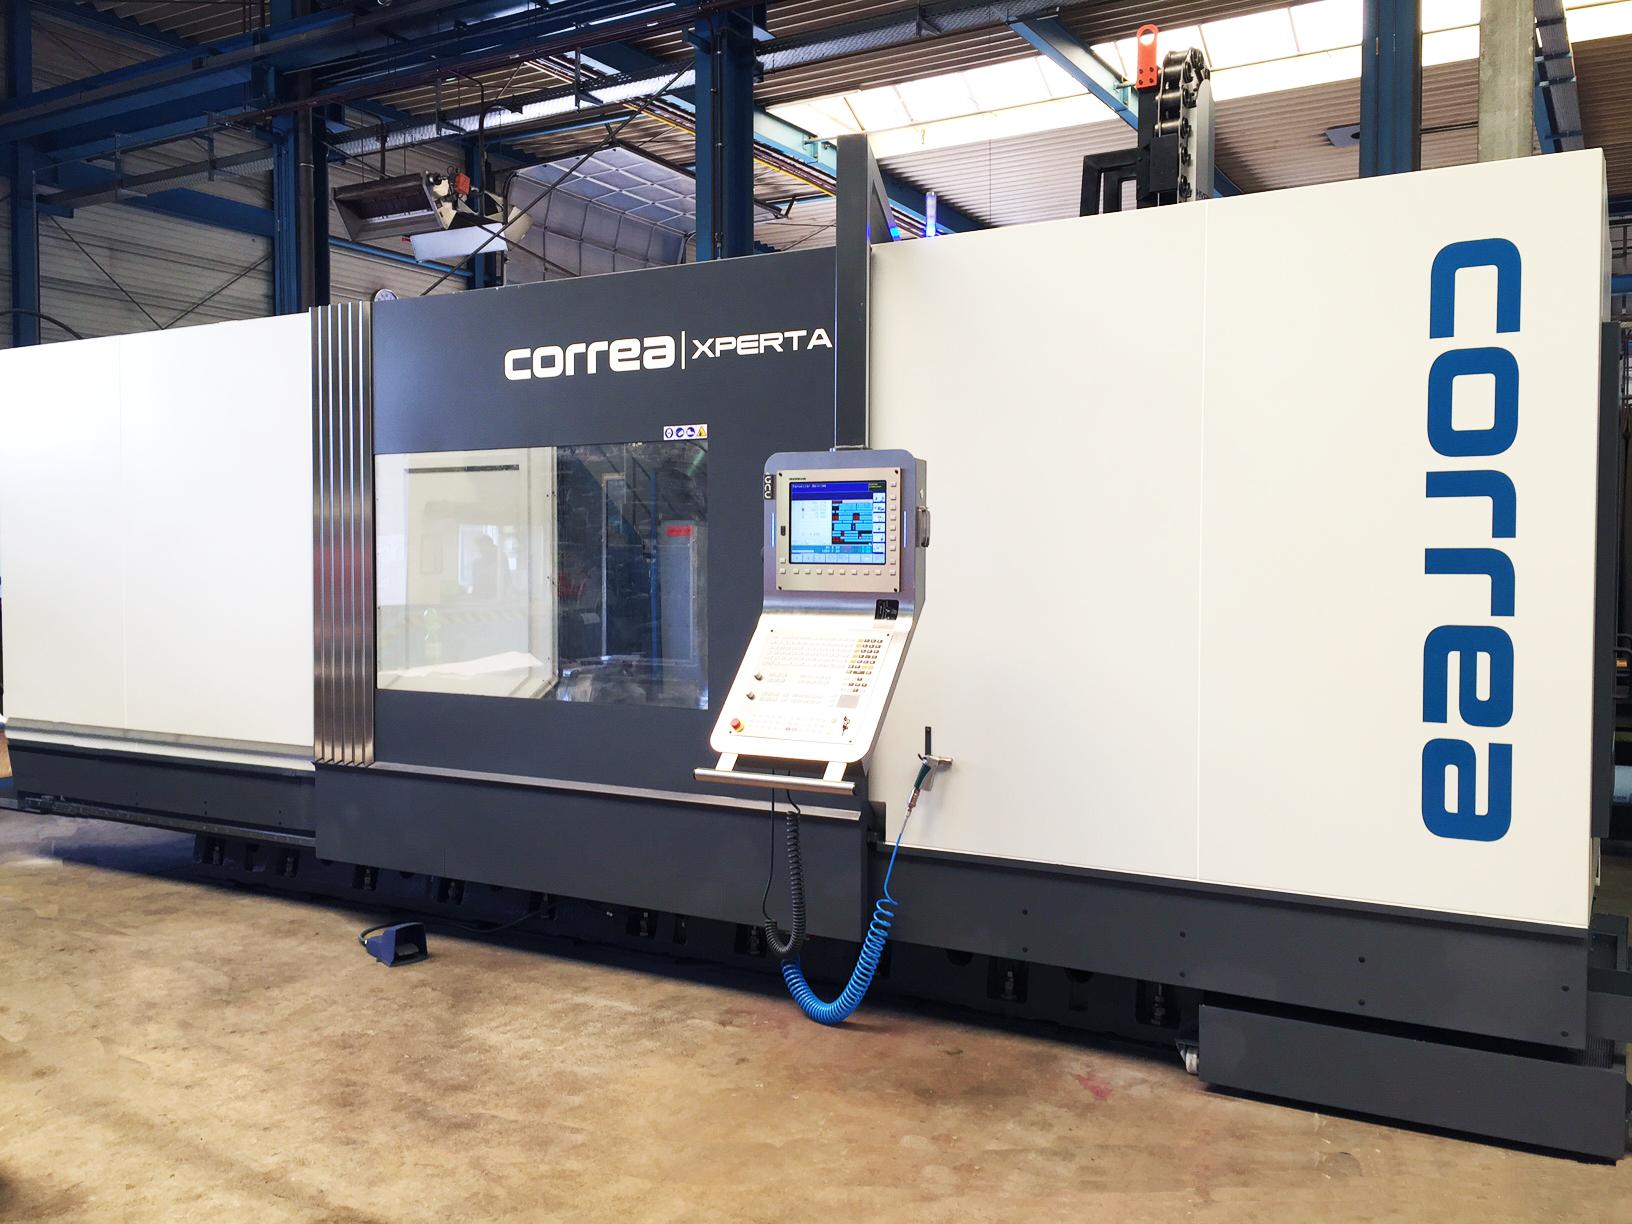 xperta-milling-machine.JPG